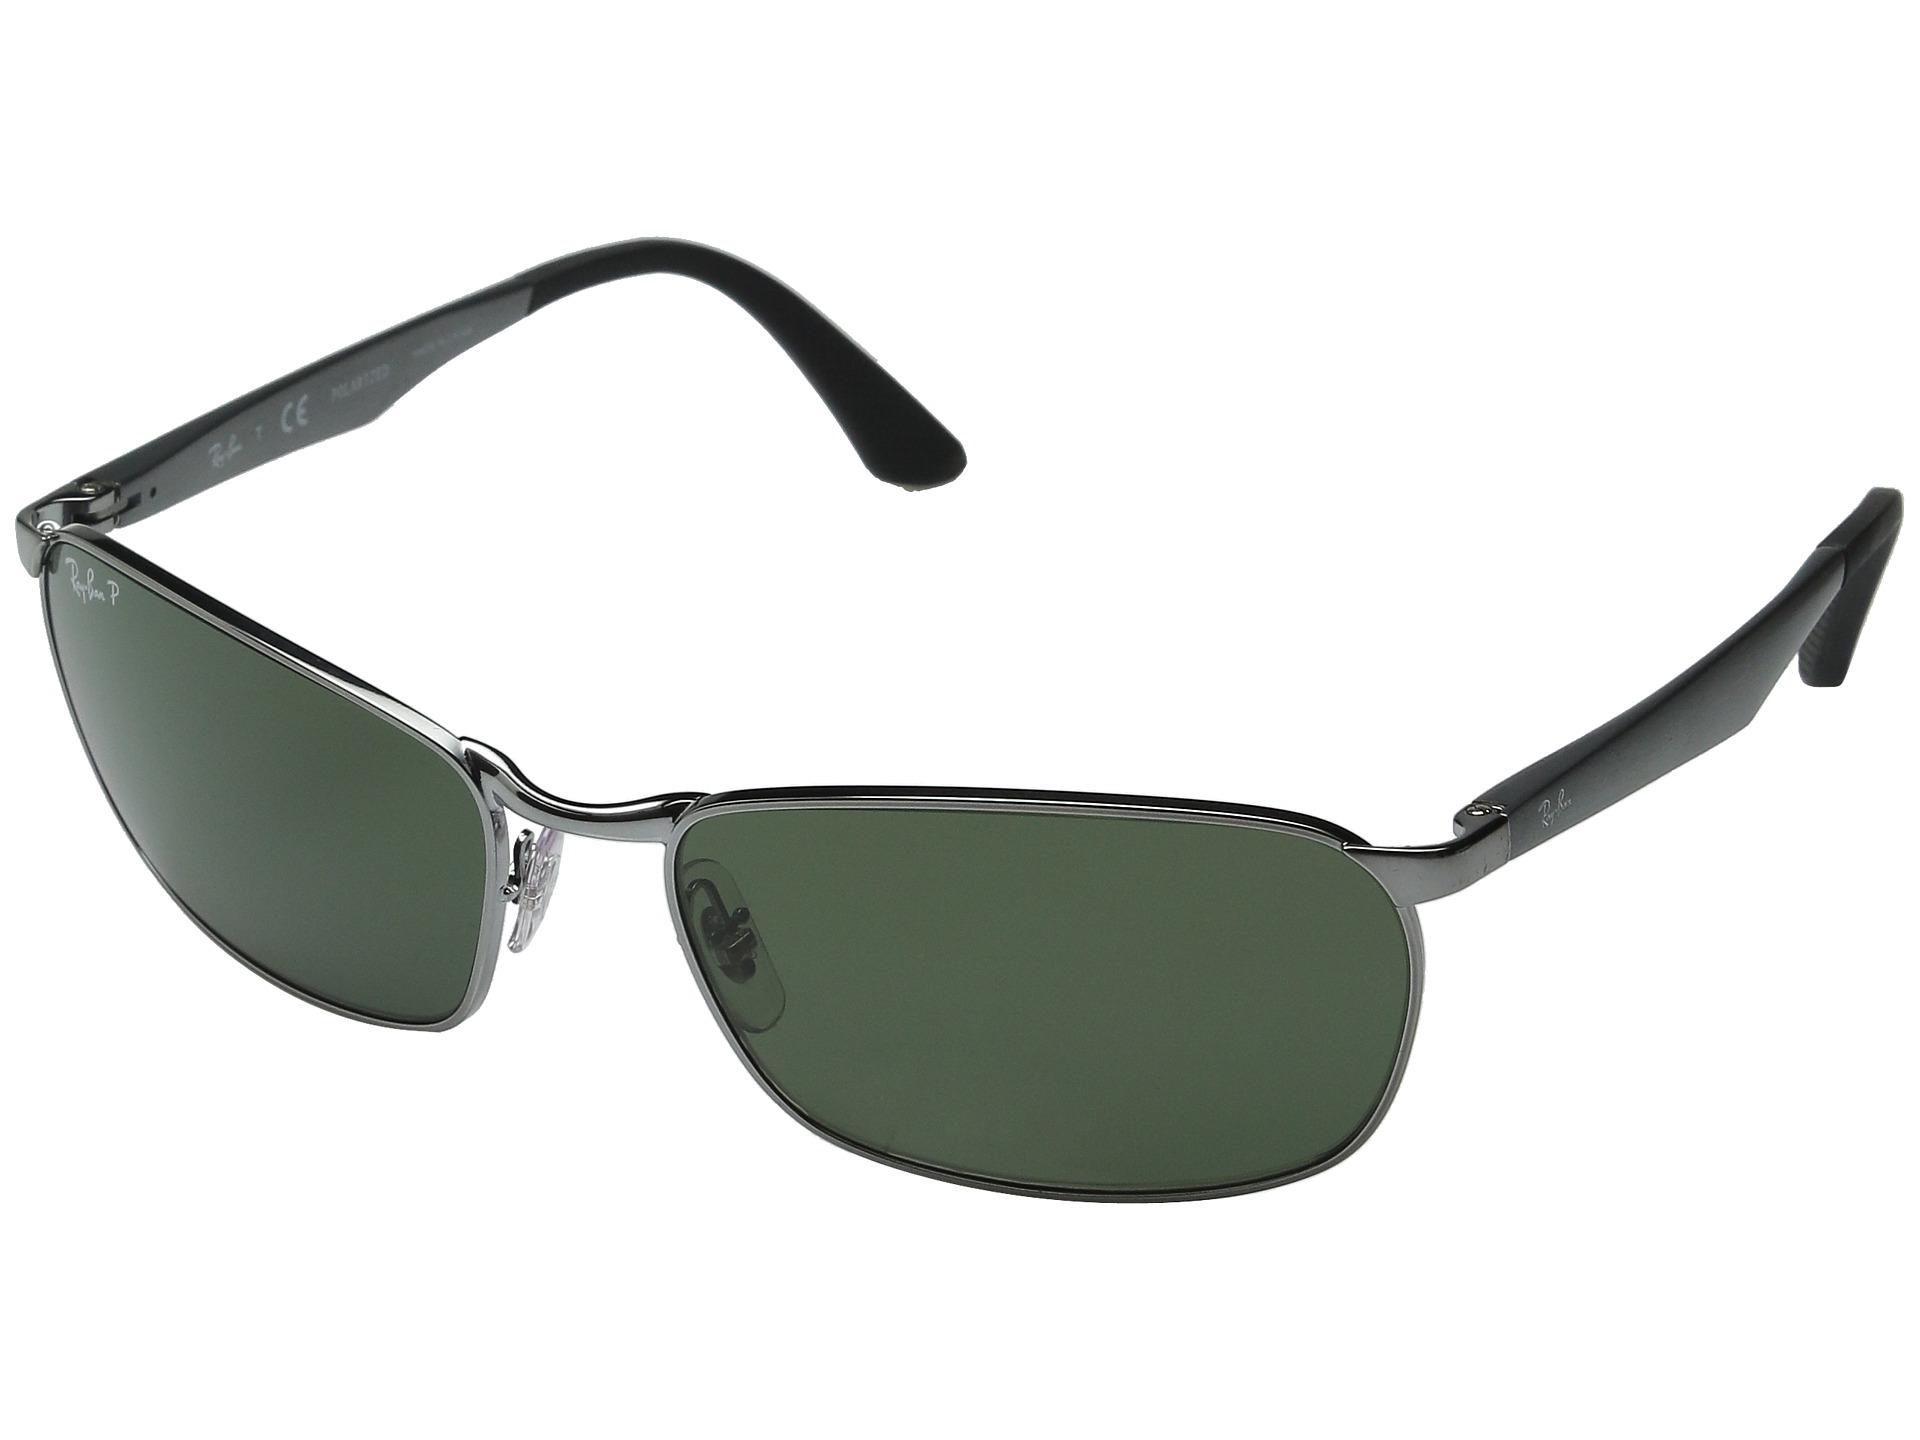 Ray Ban Rb3016 Clubmaster Sunglasses W0365 Ebony Arista Gold G 15xlt ...